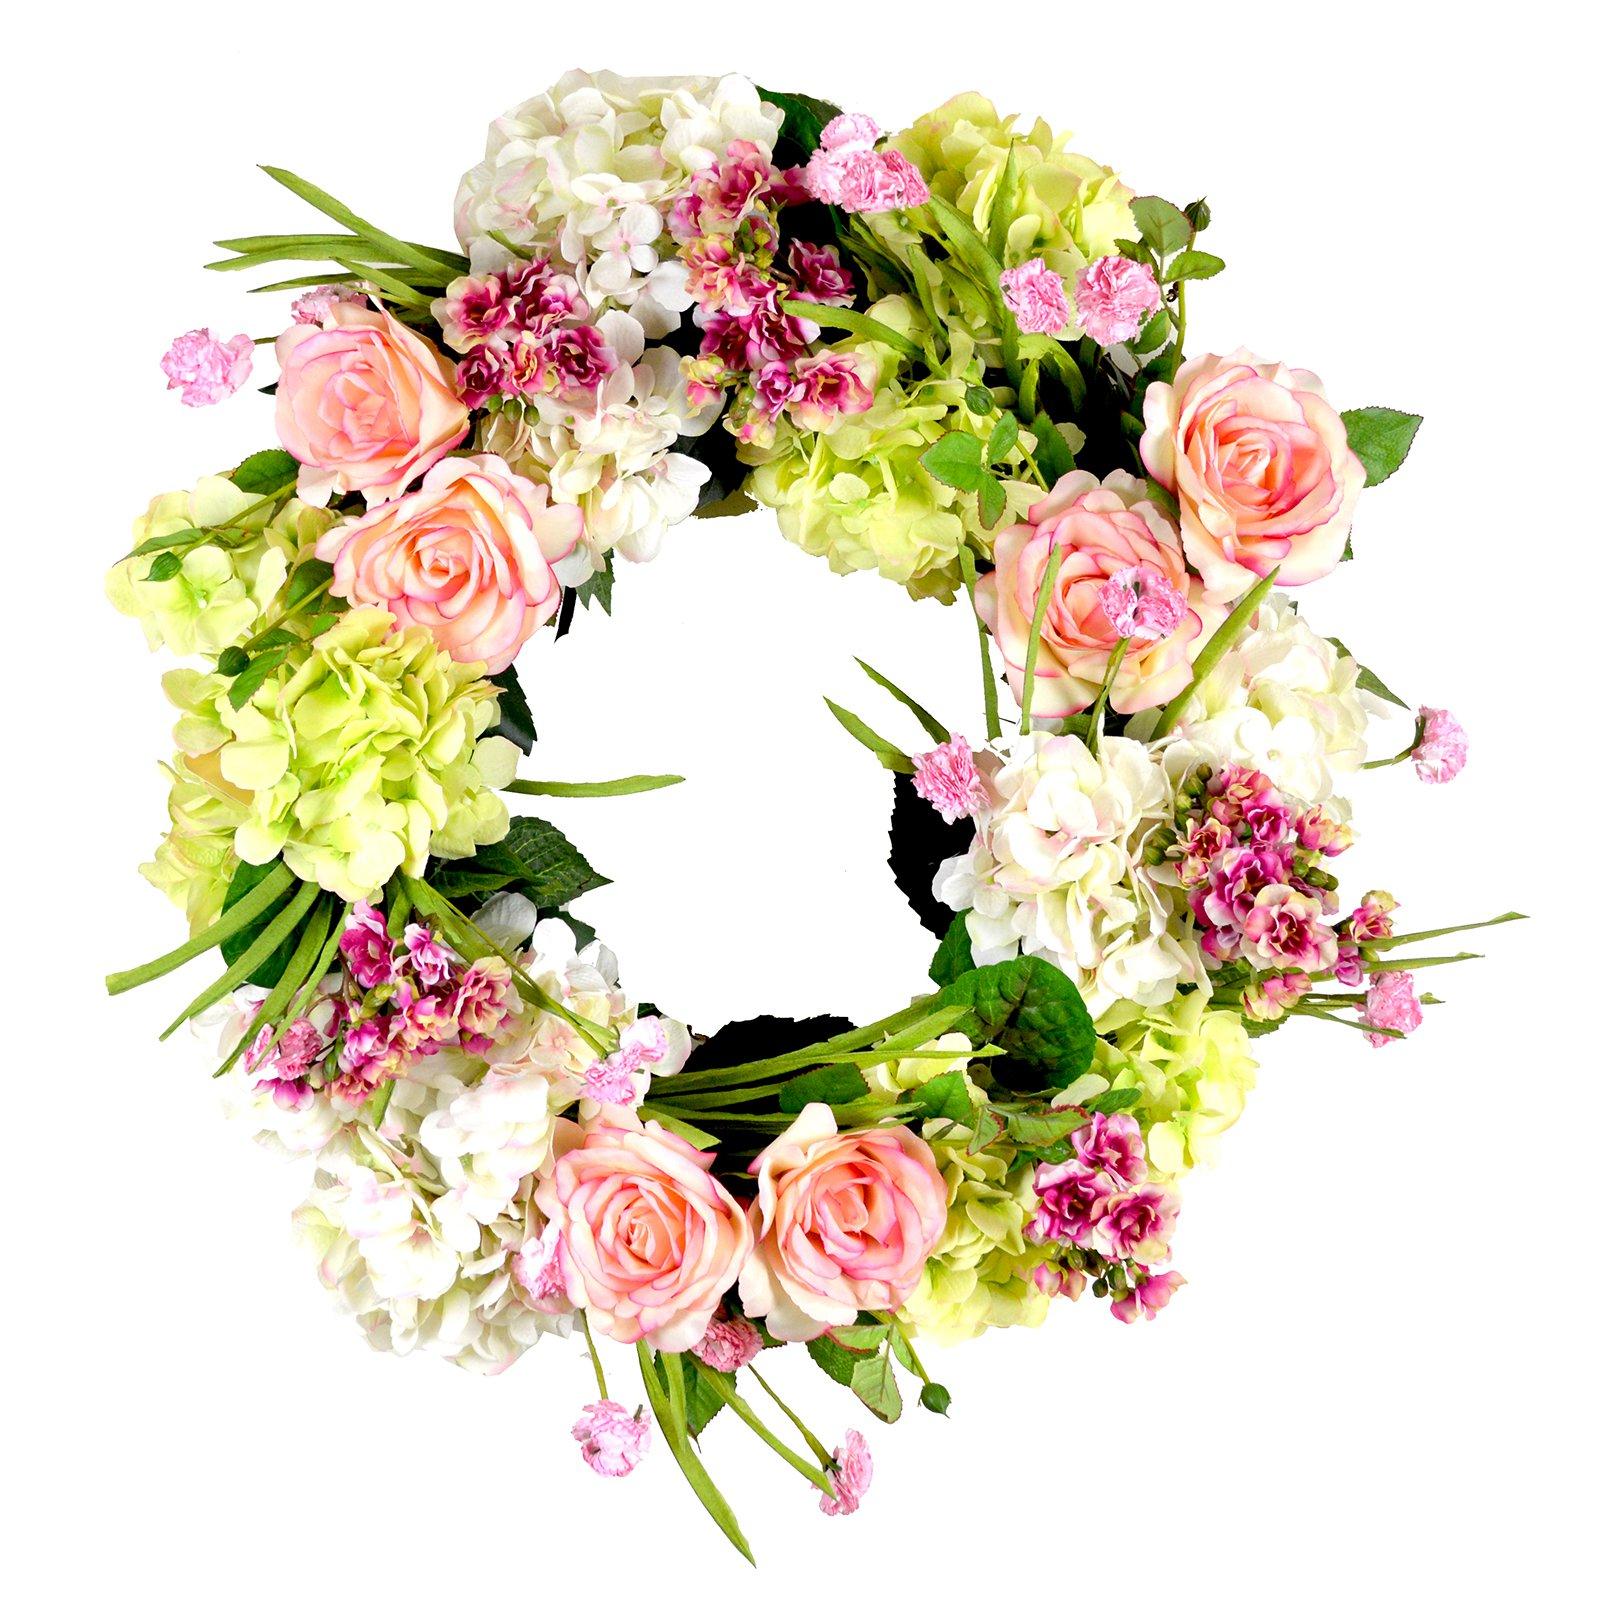 Creative Displays & Designs Multi Color Hydrangea Wreath Silk Plant